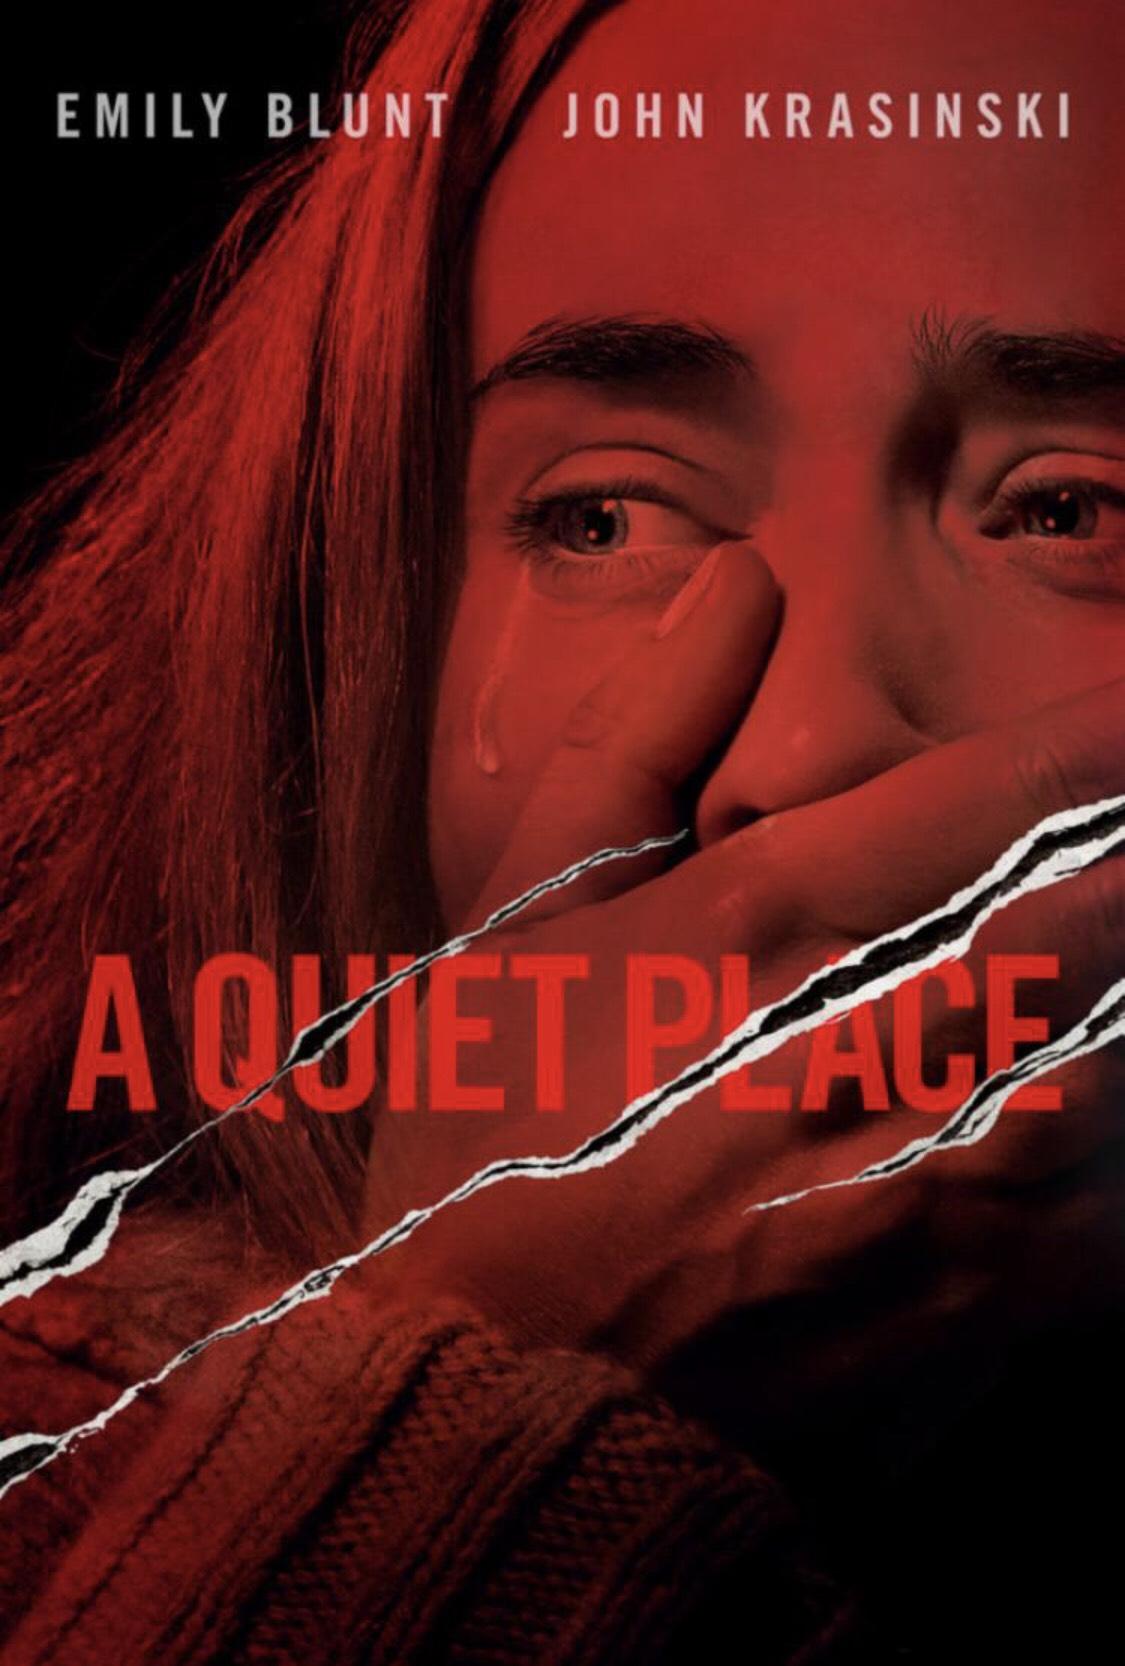 Viele 4K iTunes Titel im Angebot: z.B. A quiet place - (2018) 4K, Dolby Vision & Atmos